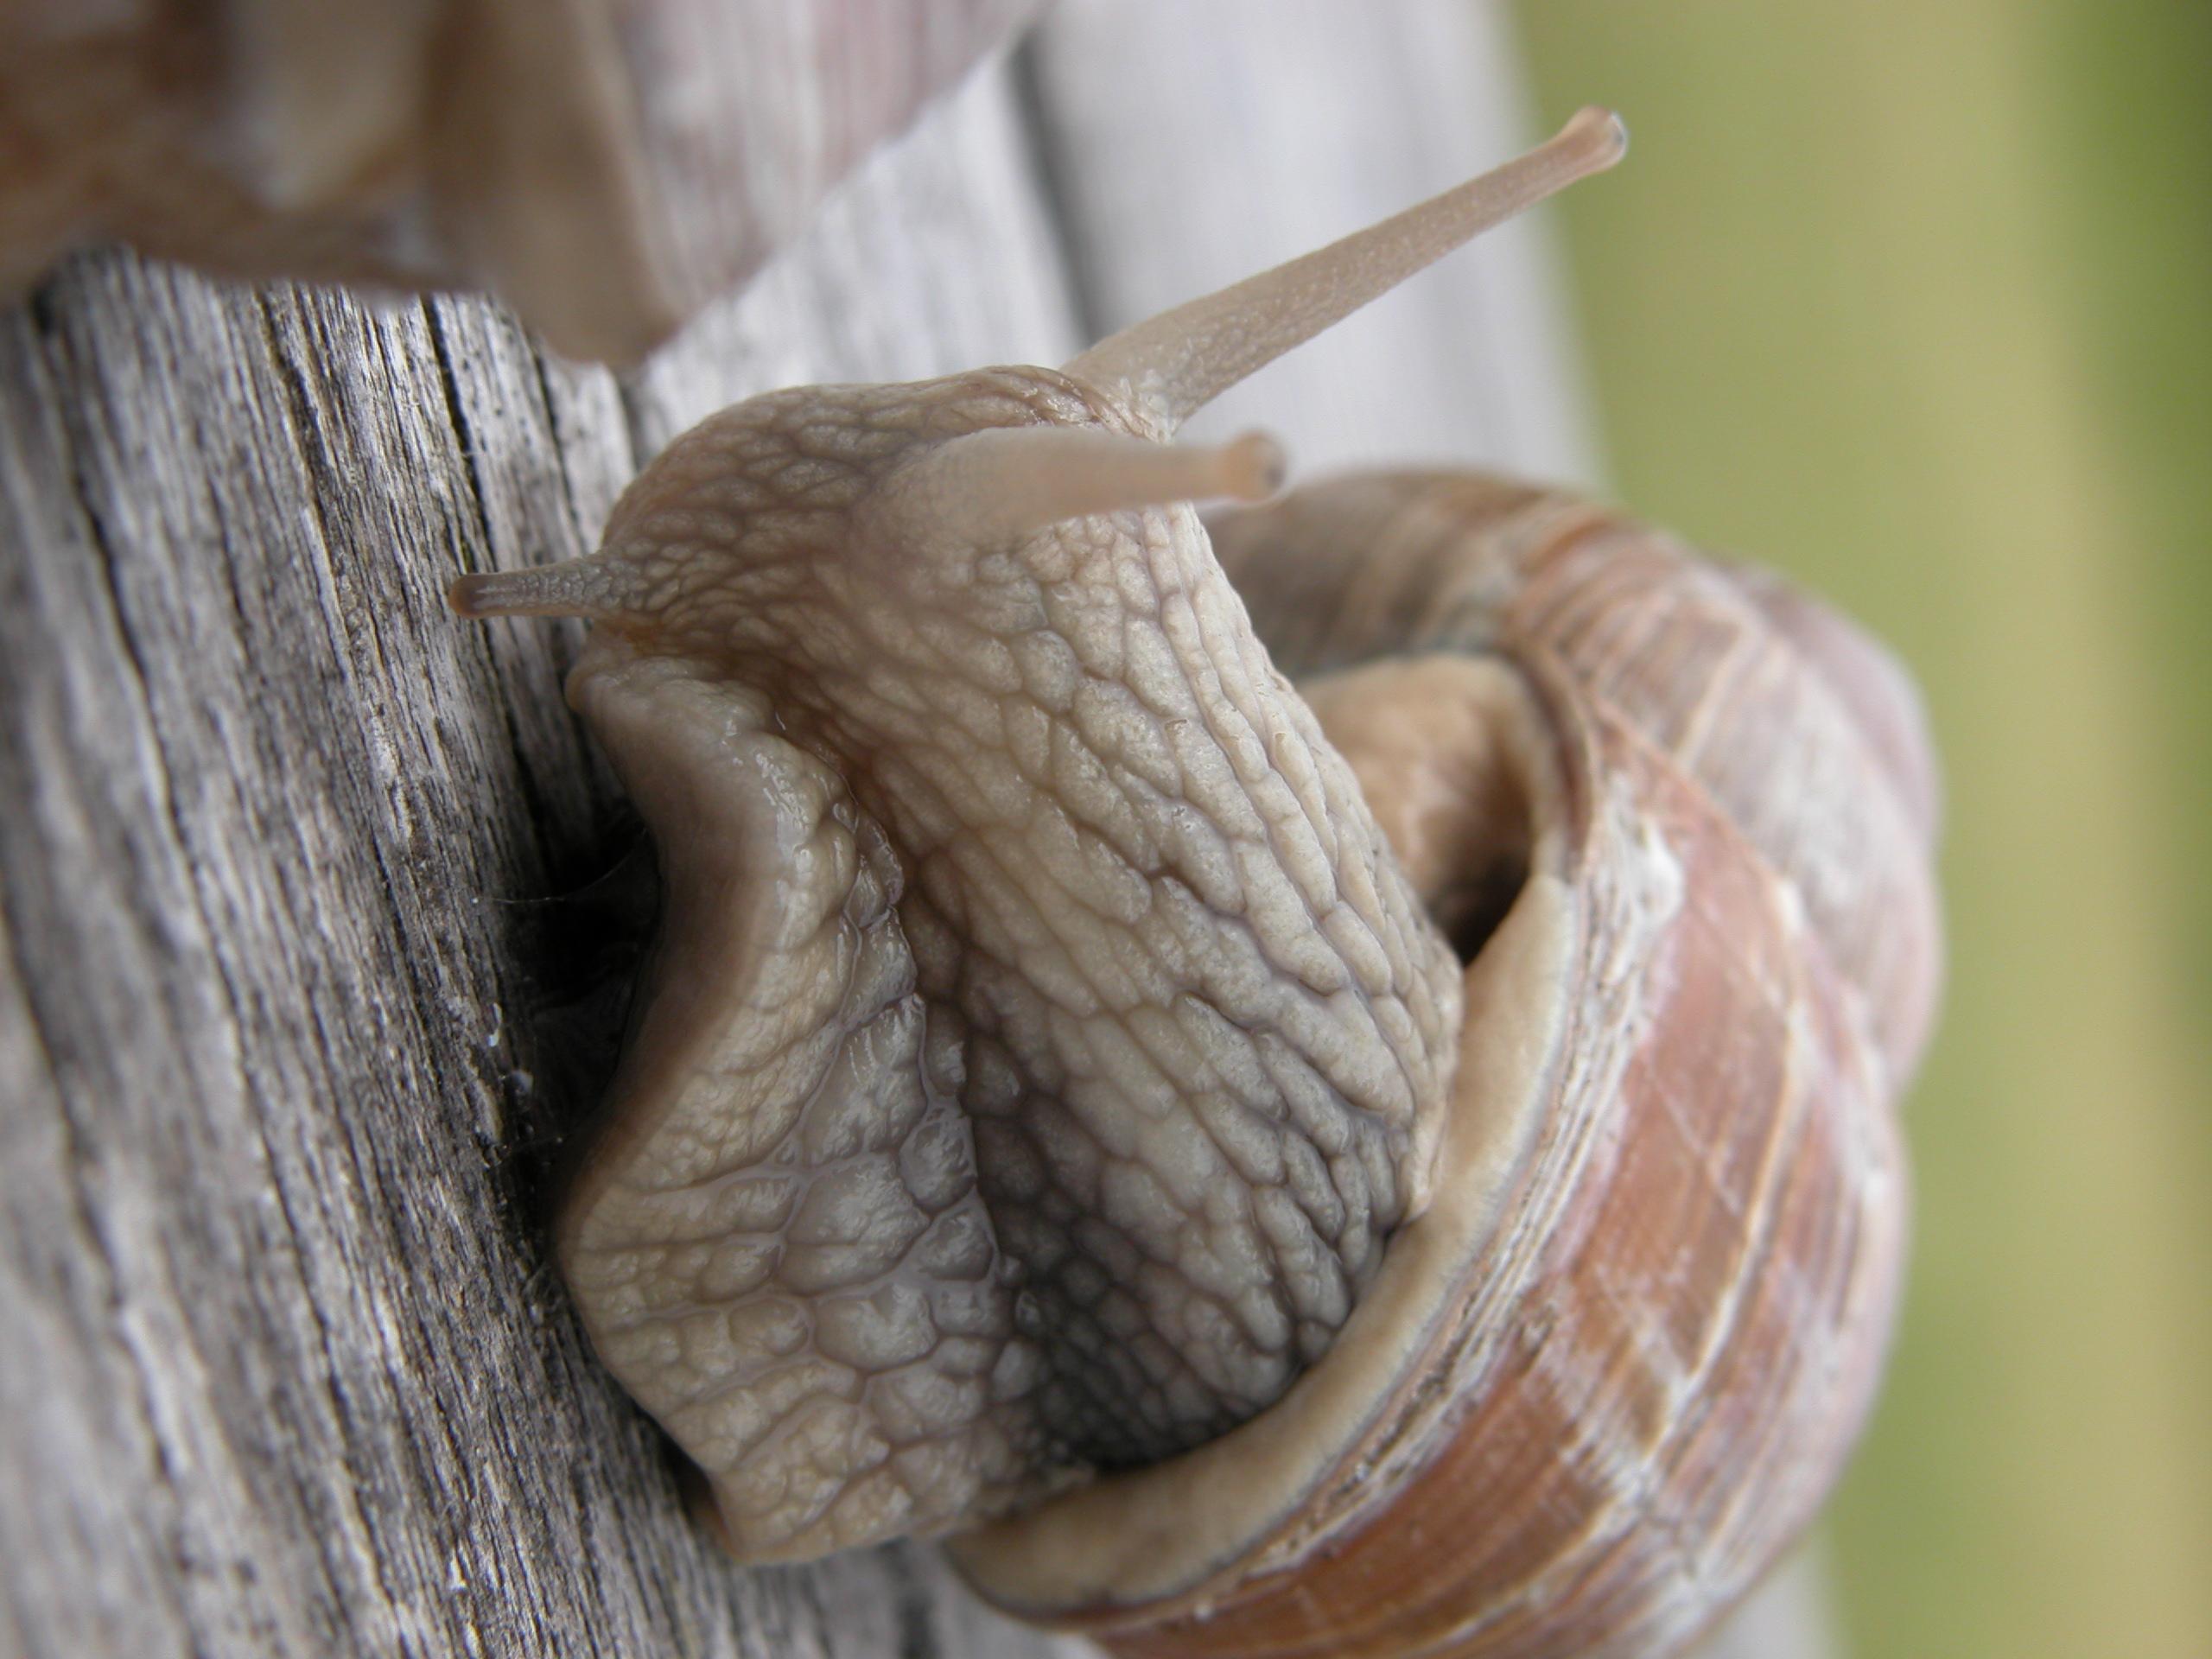 snail slug glistening slimey hard soft antennae slime shell